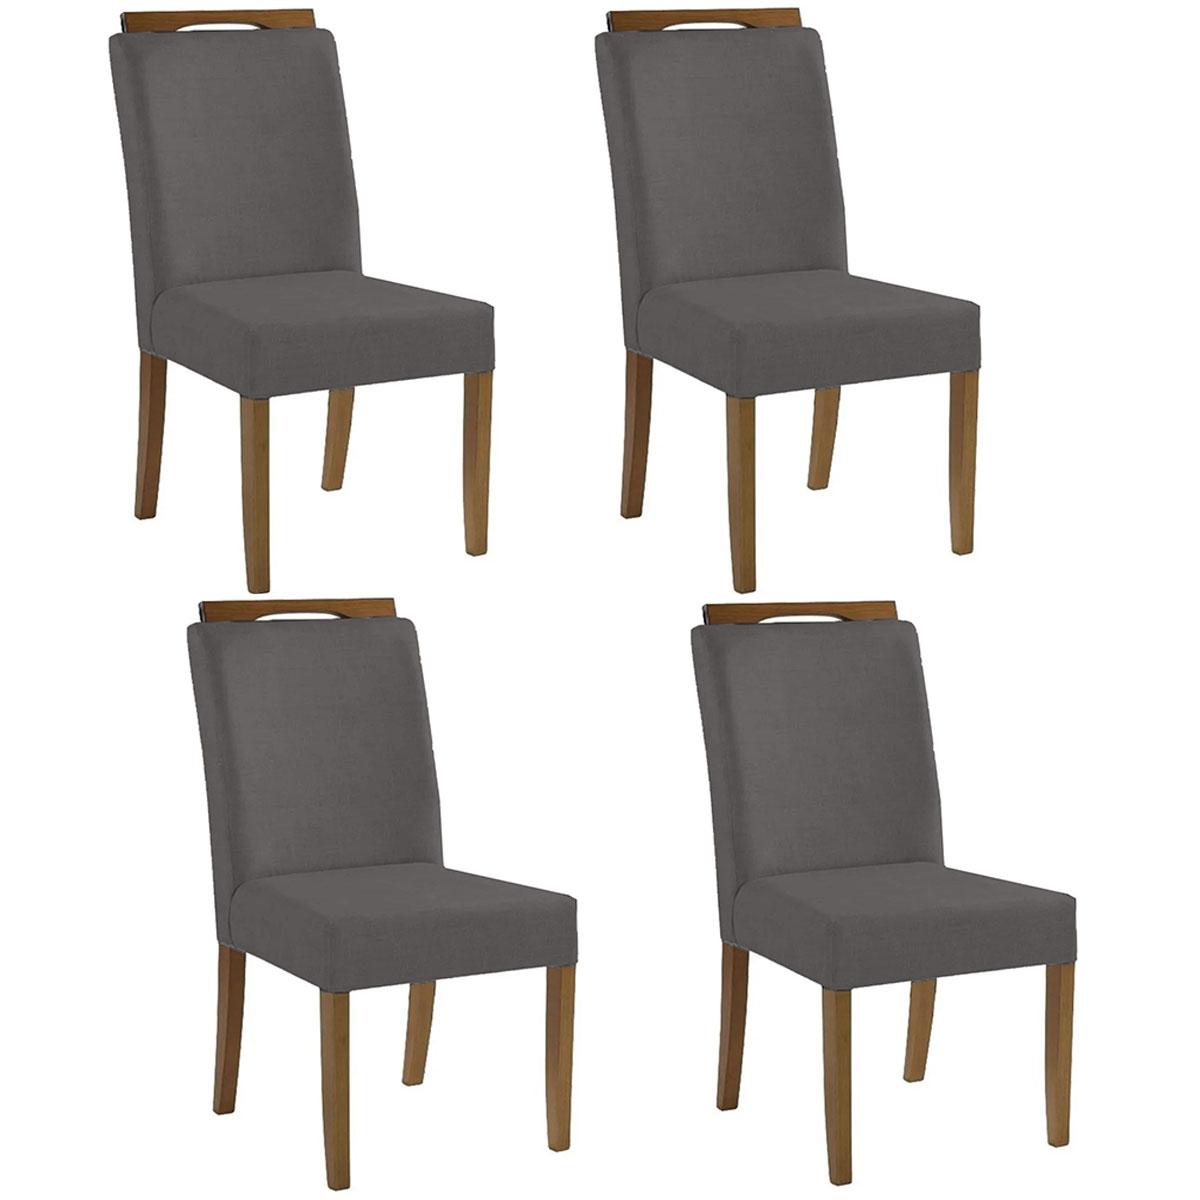 Kit 4 Cadeiras Estofadas Heloísa 100% Madeira Suede Cinza